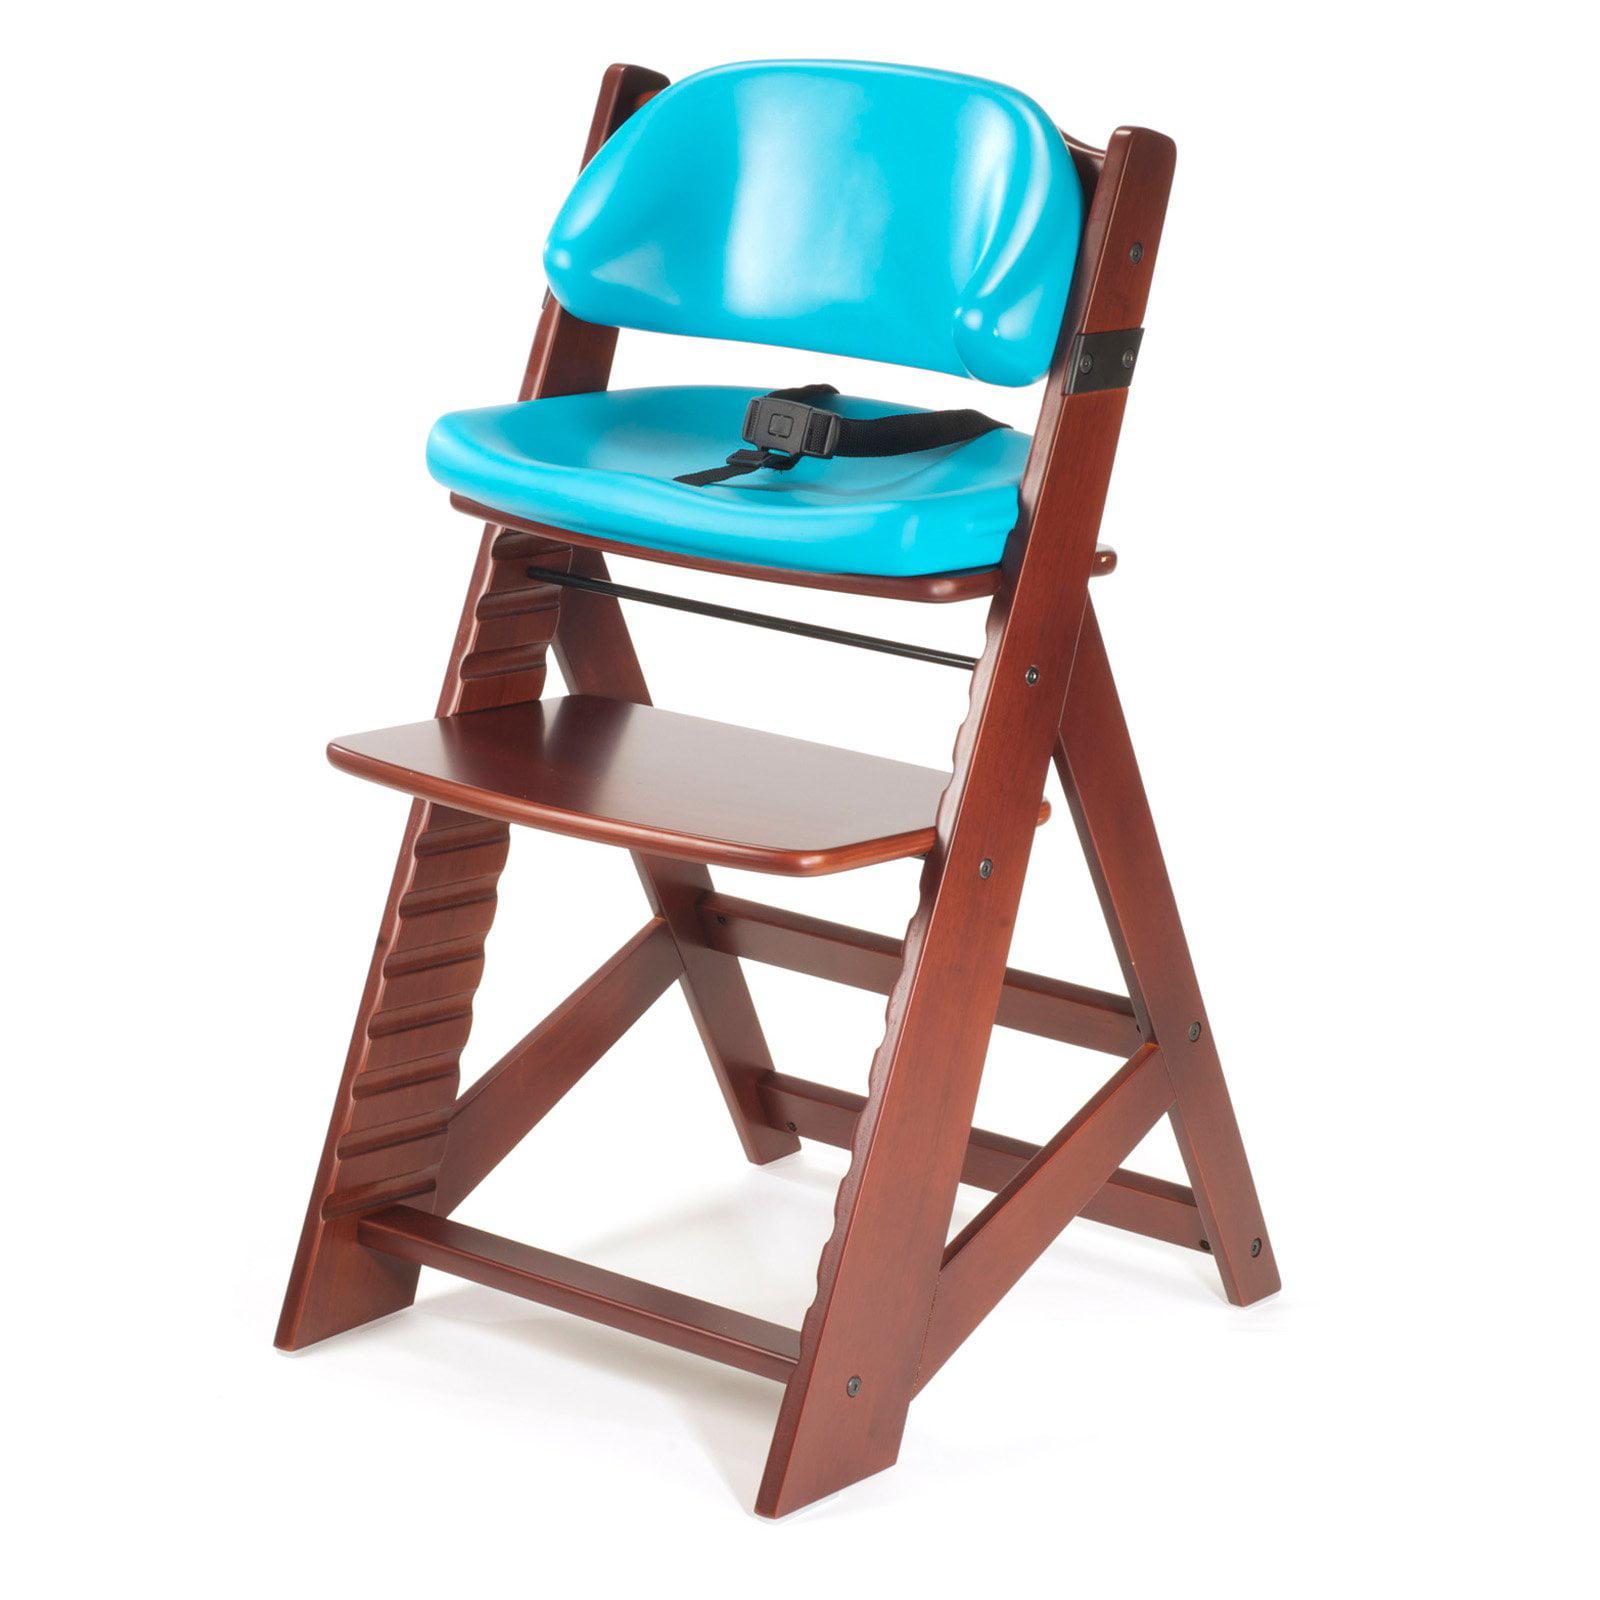 Keekaroo Height Right Kids Chair Mahogany with Aqua Comfort Cushions